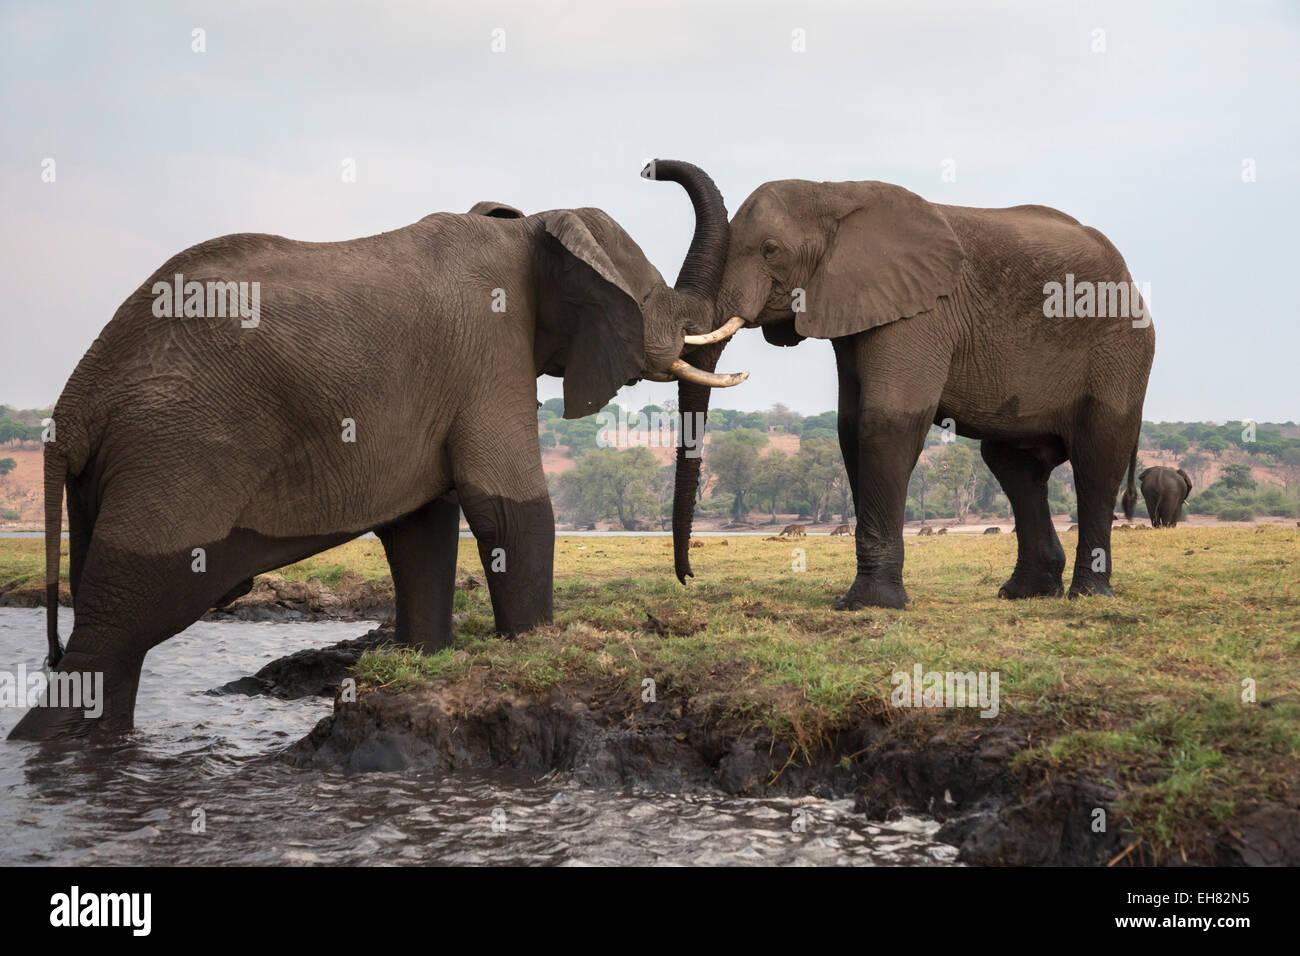 Les éléphants d'Afrique (Loxodonta africana), Chobe National Park, Botswana, Africa Photo Stock